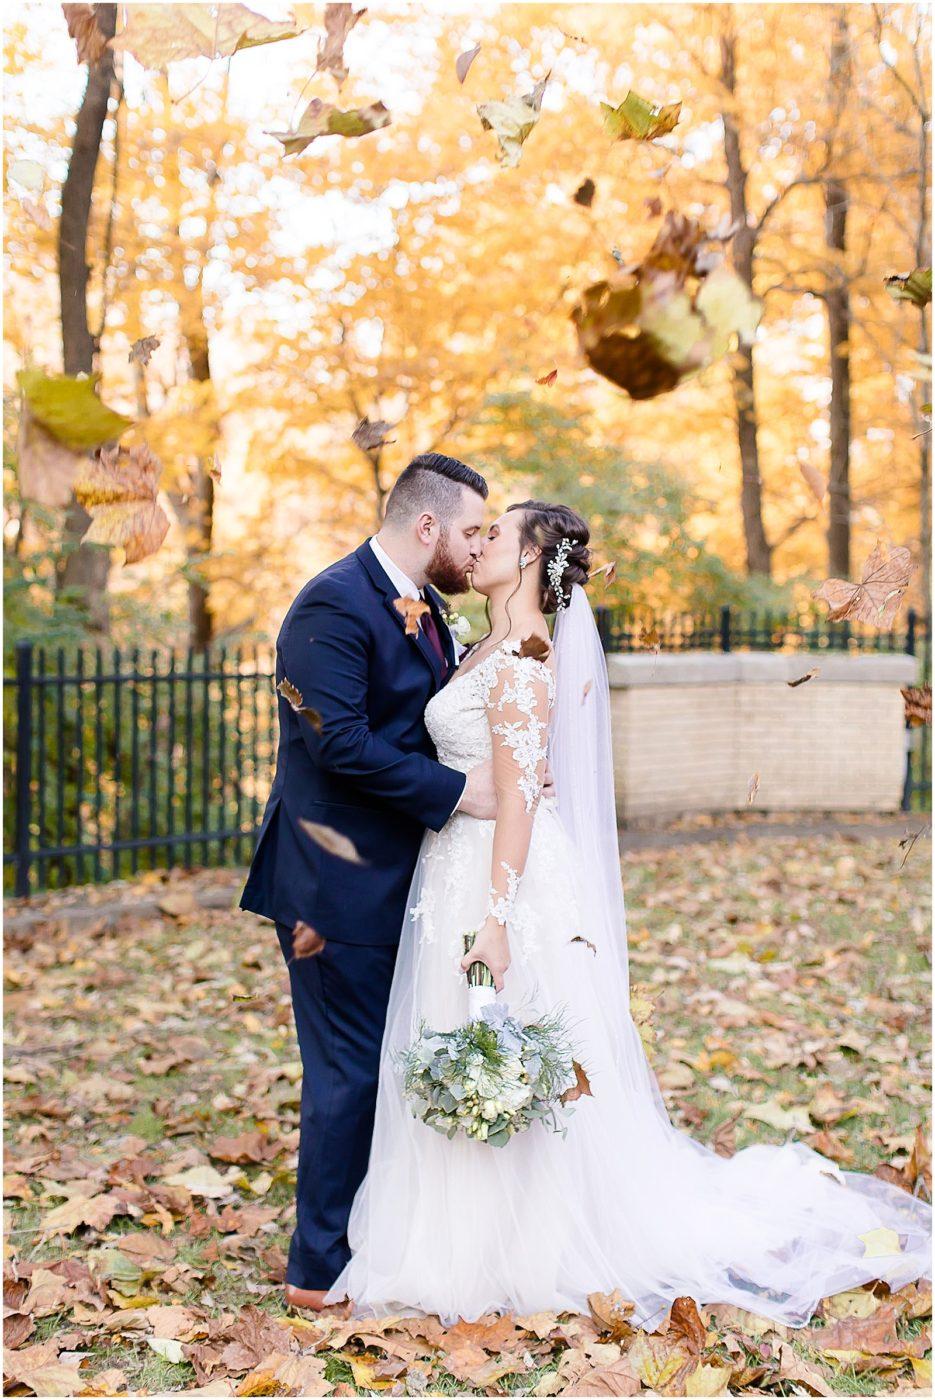 Elegant-fall-wedding-at-Laurel-Hall-Indianapolis-wedding-photographer_0054-935x1400.jpg